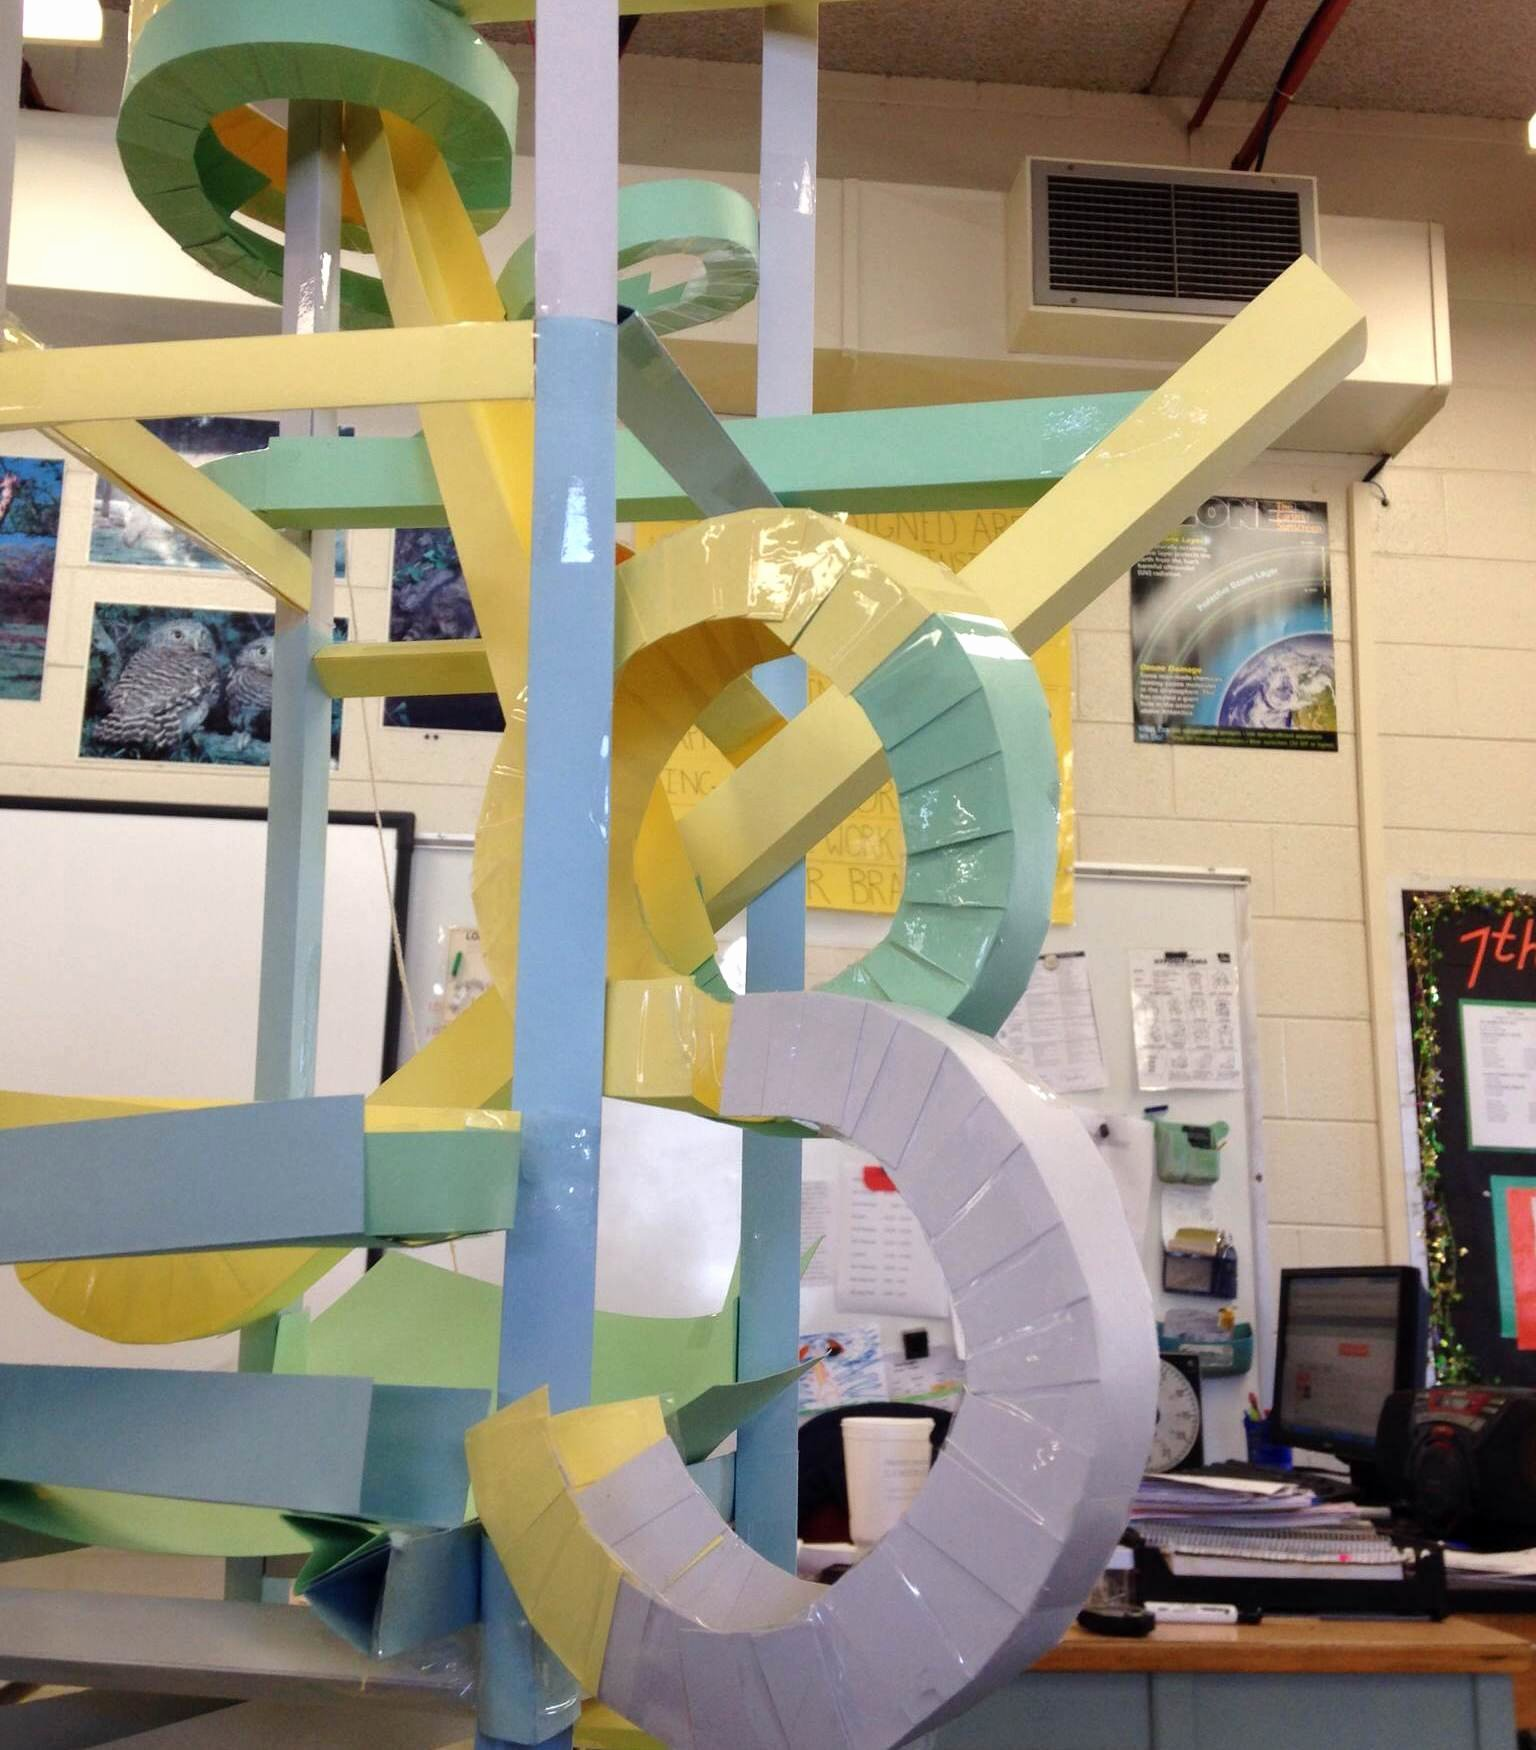 Paper Roller Coaster Blueprints Inspirational Paper Roller Coasters